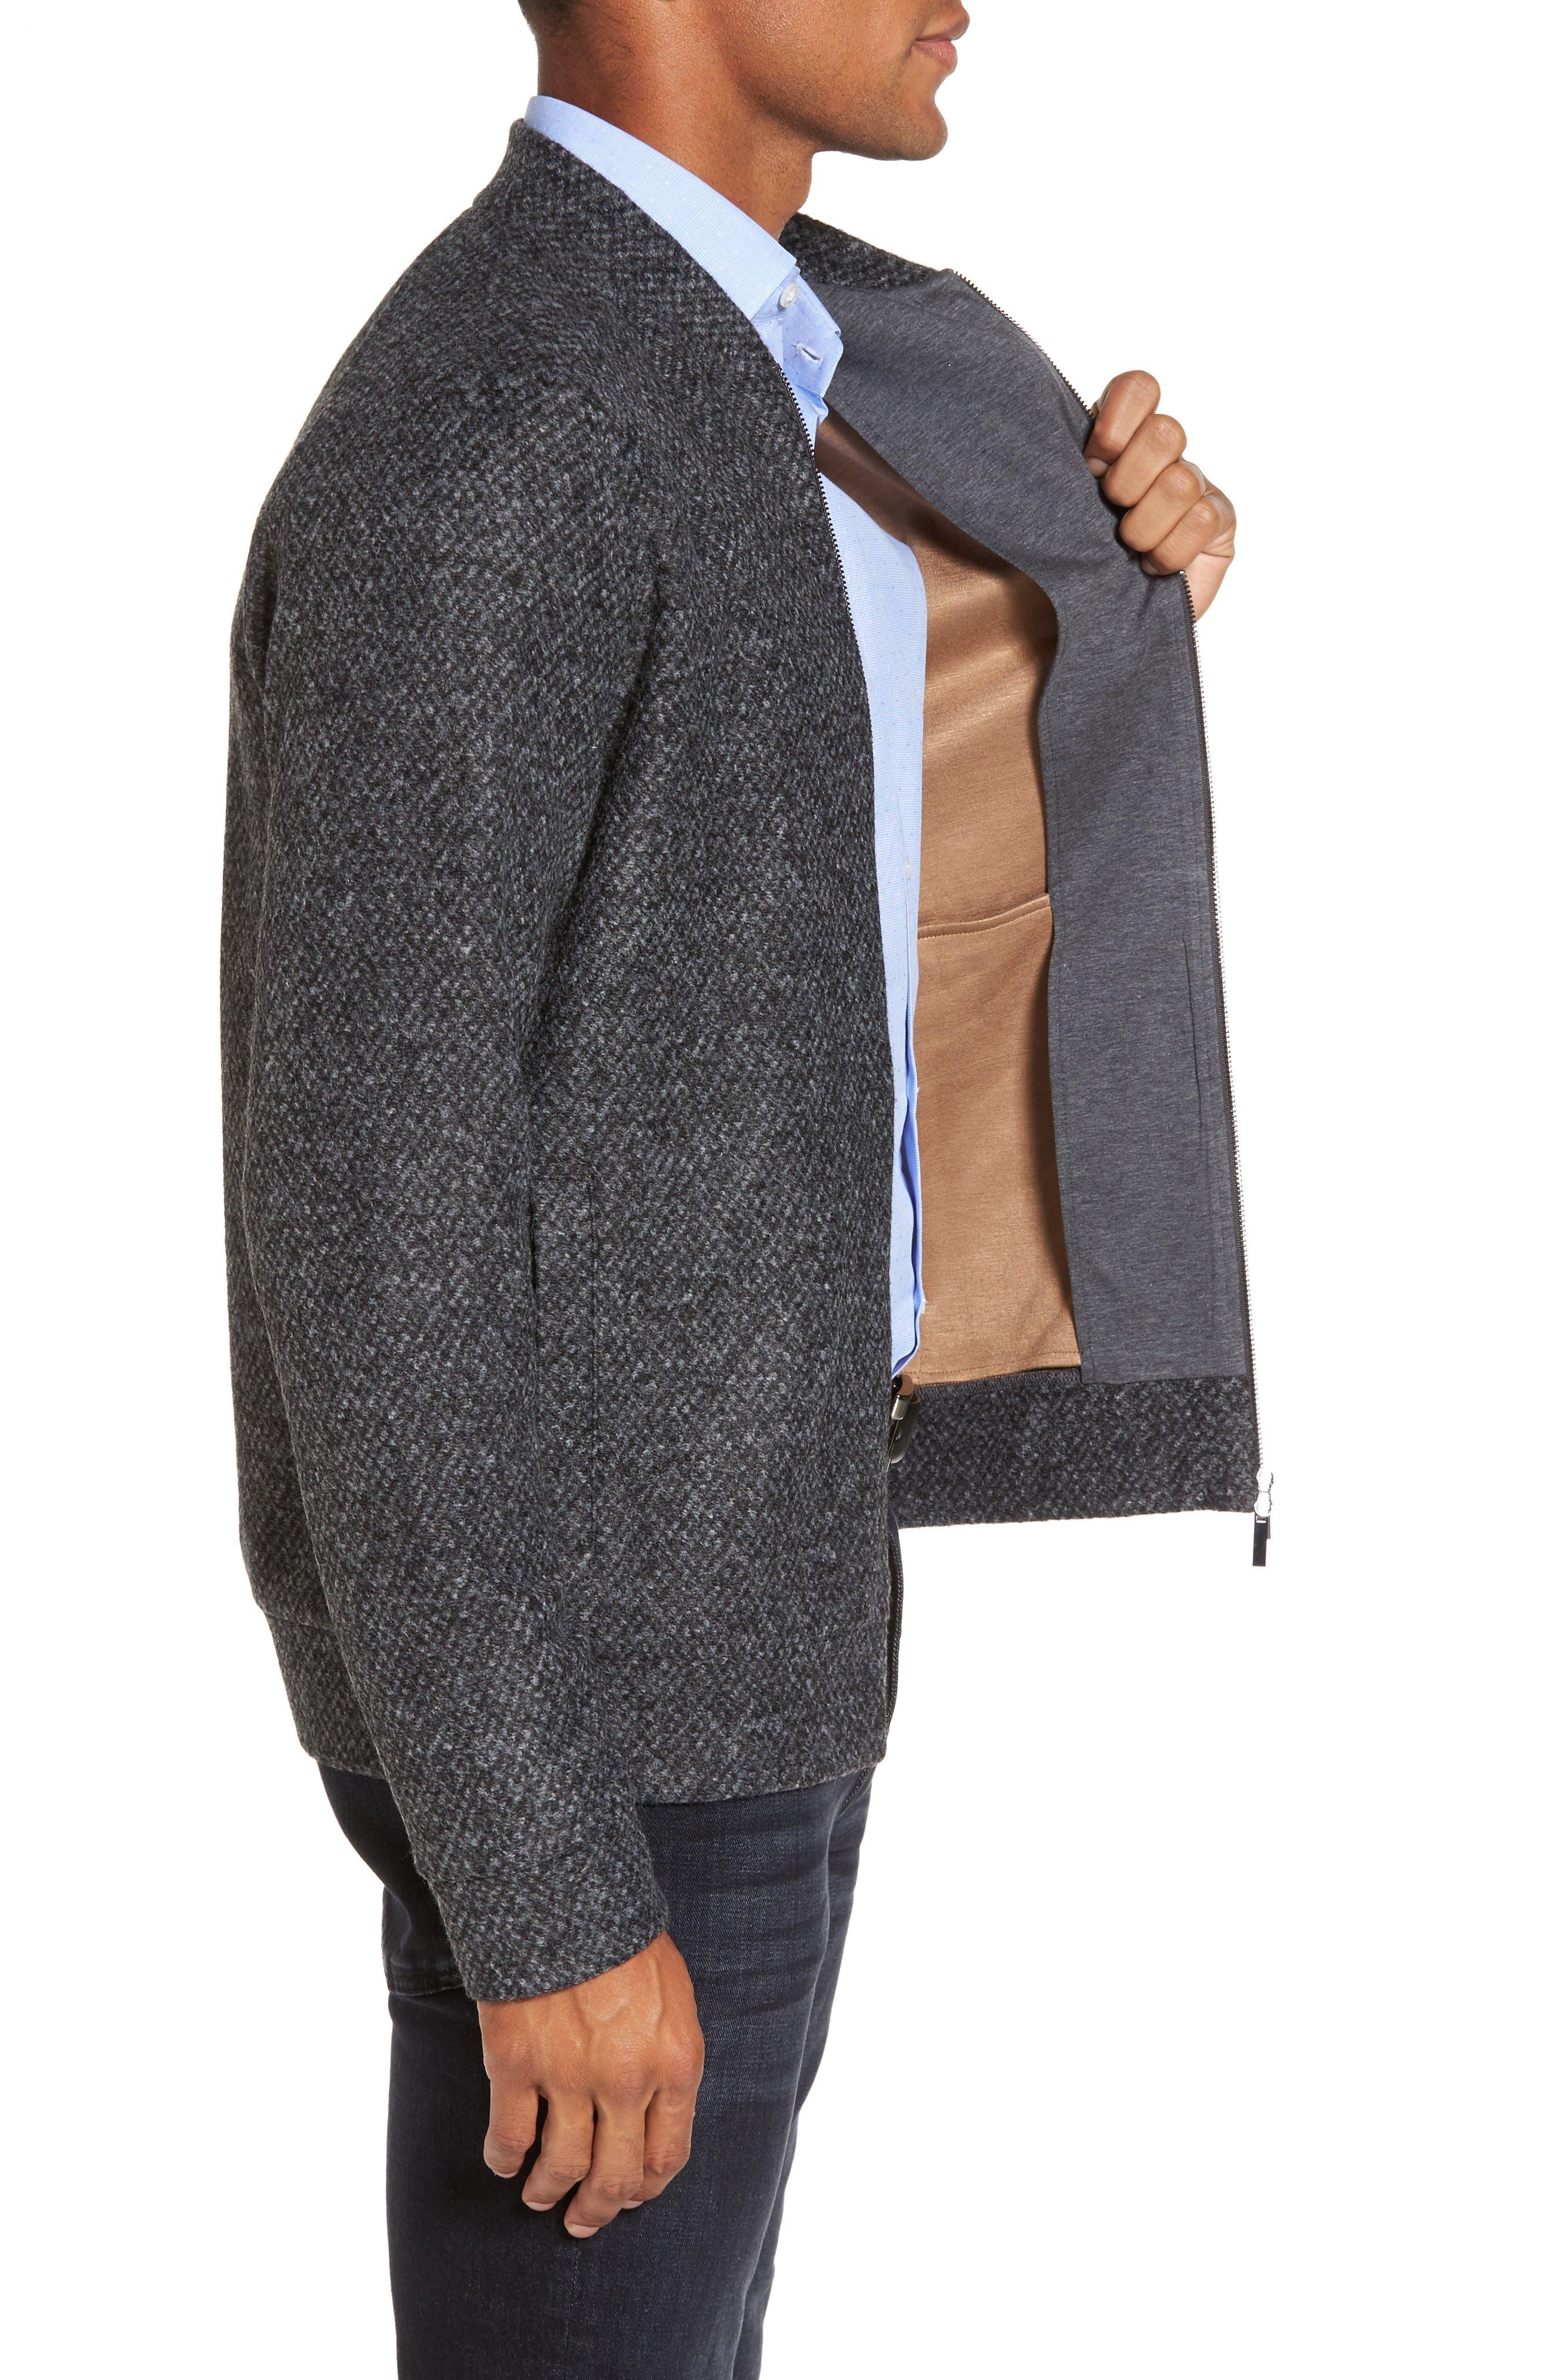 Salea Slim Fit Bomber Jacket,                             Alternate thumbnail 3, color,                             Grey